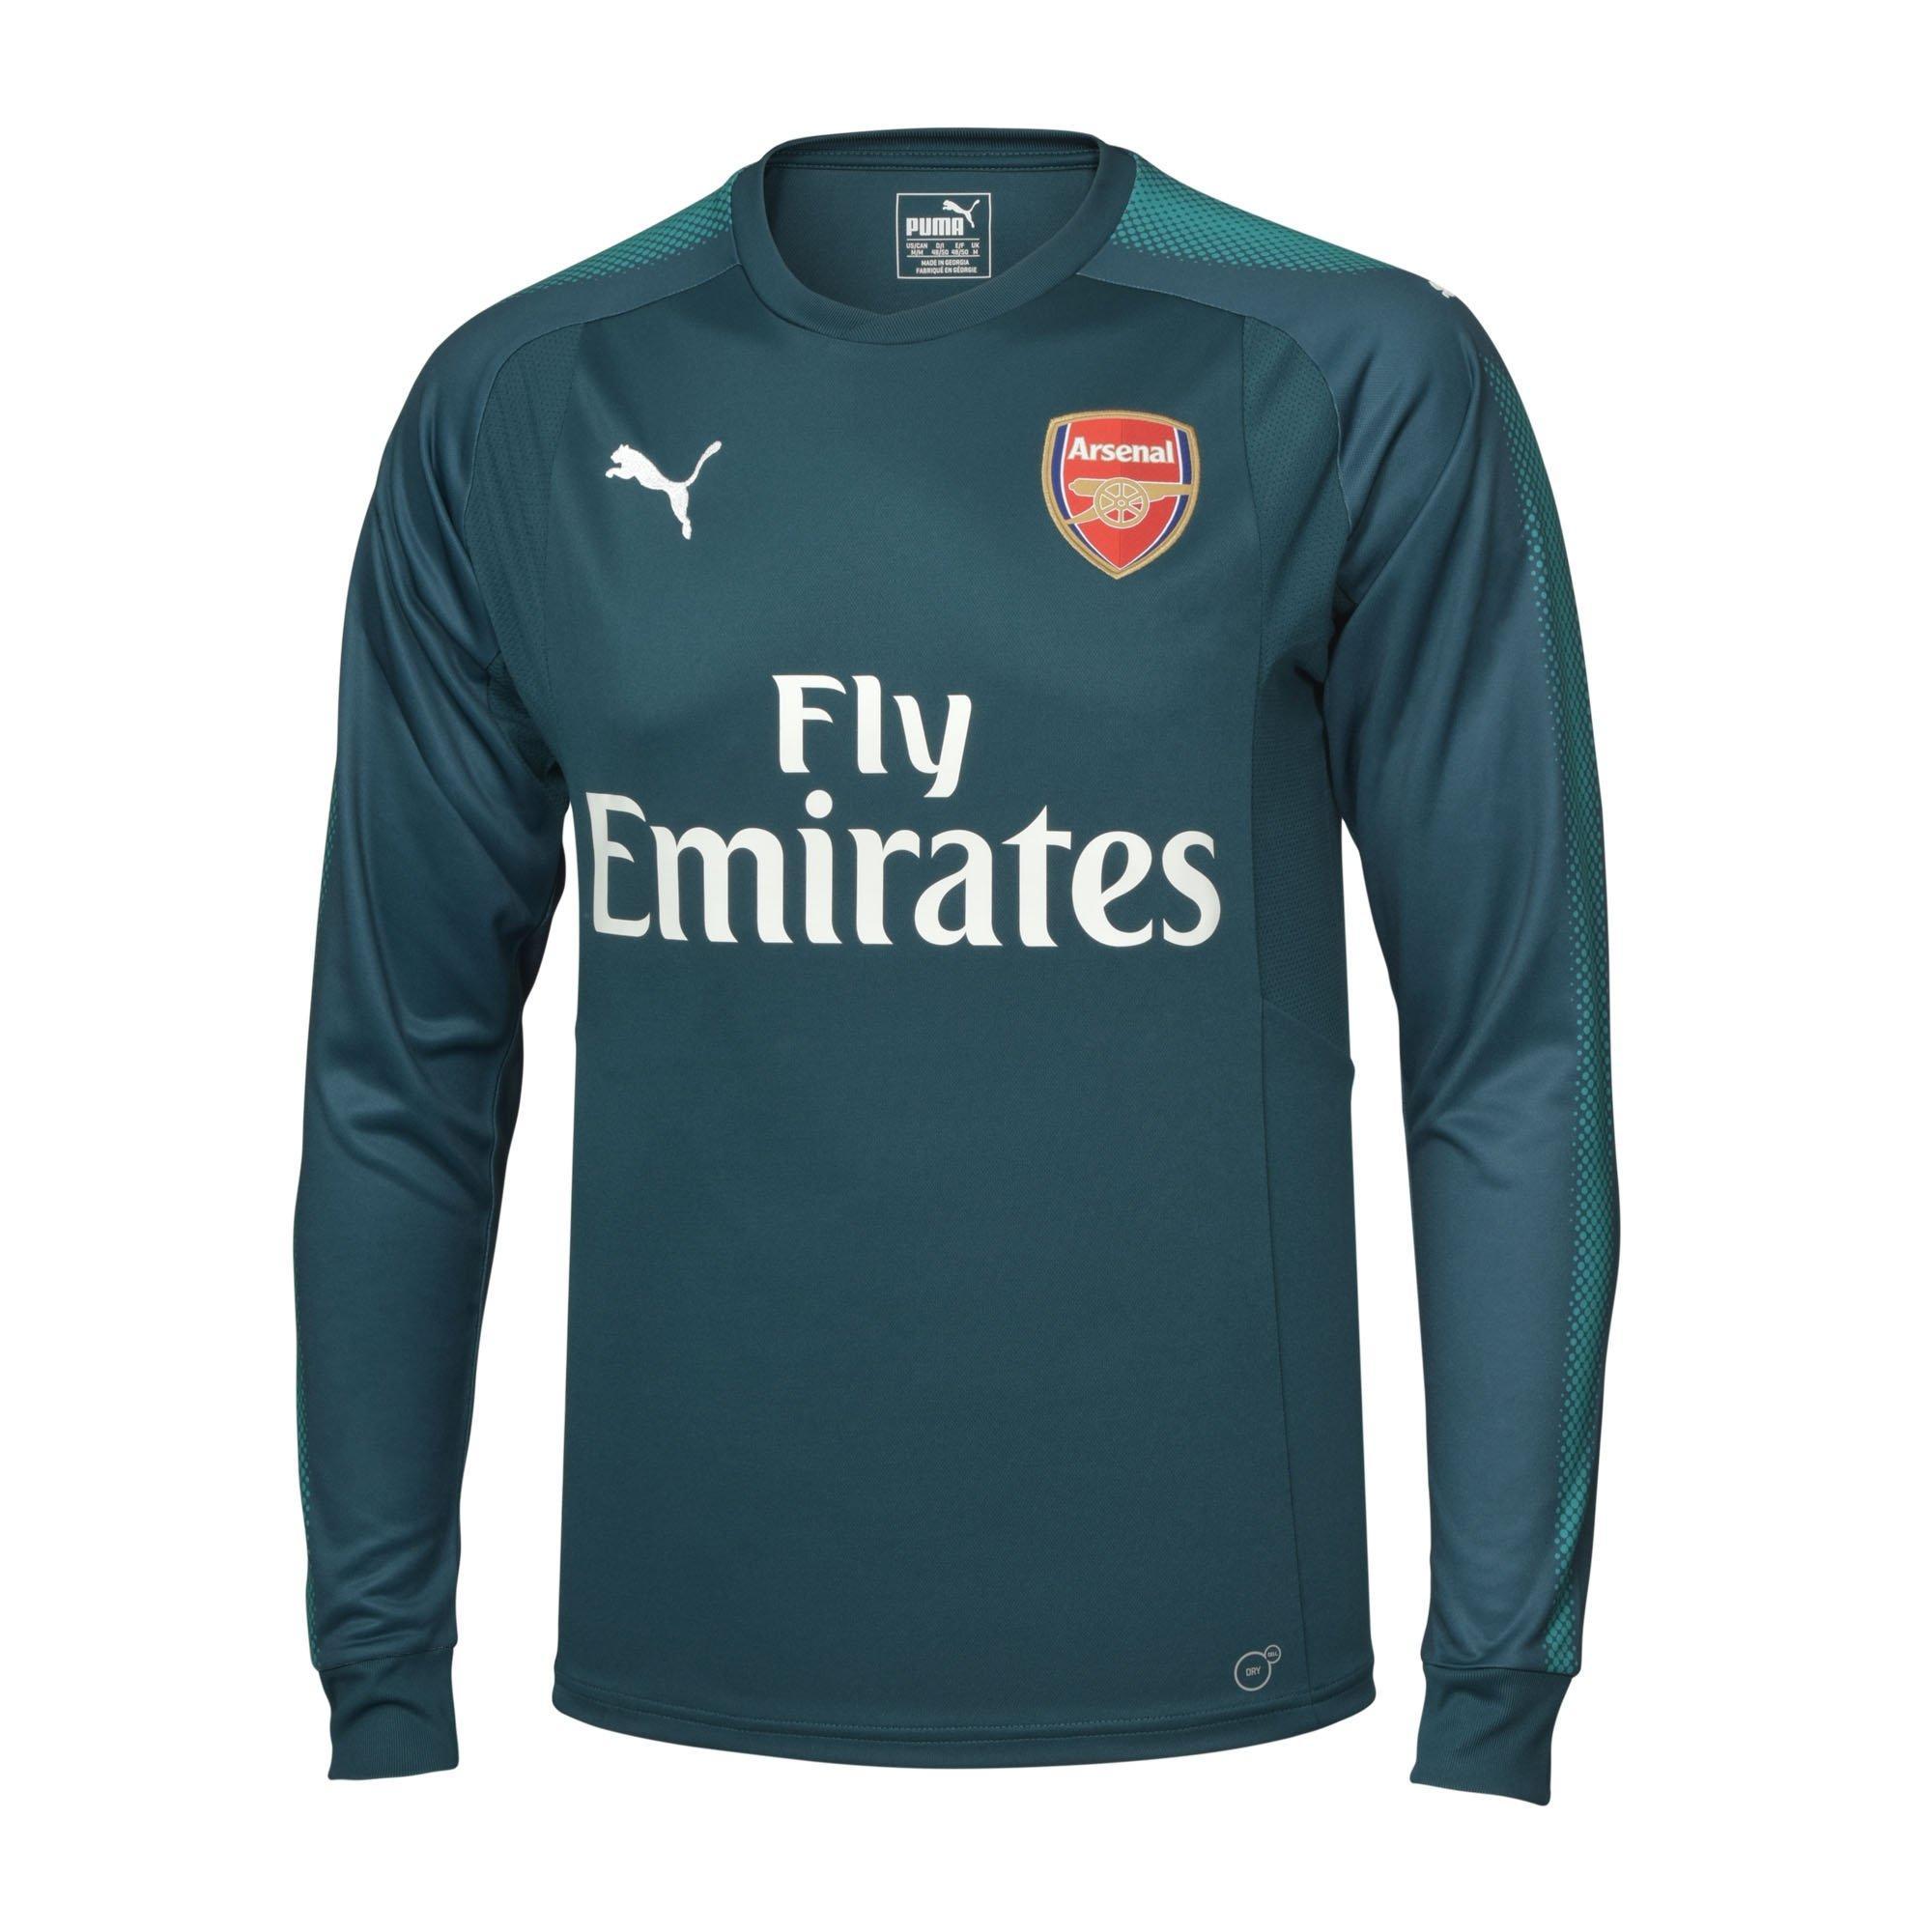 new arsenal shirt on sale   OFF72% Discounts 77f7ac1dd